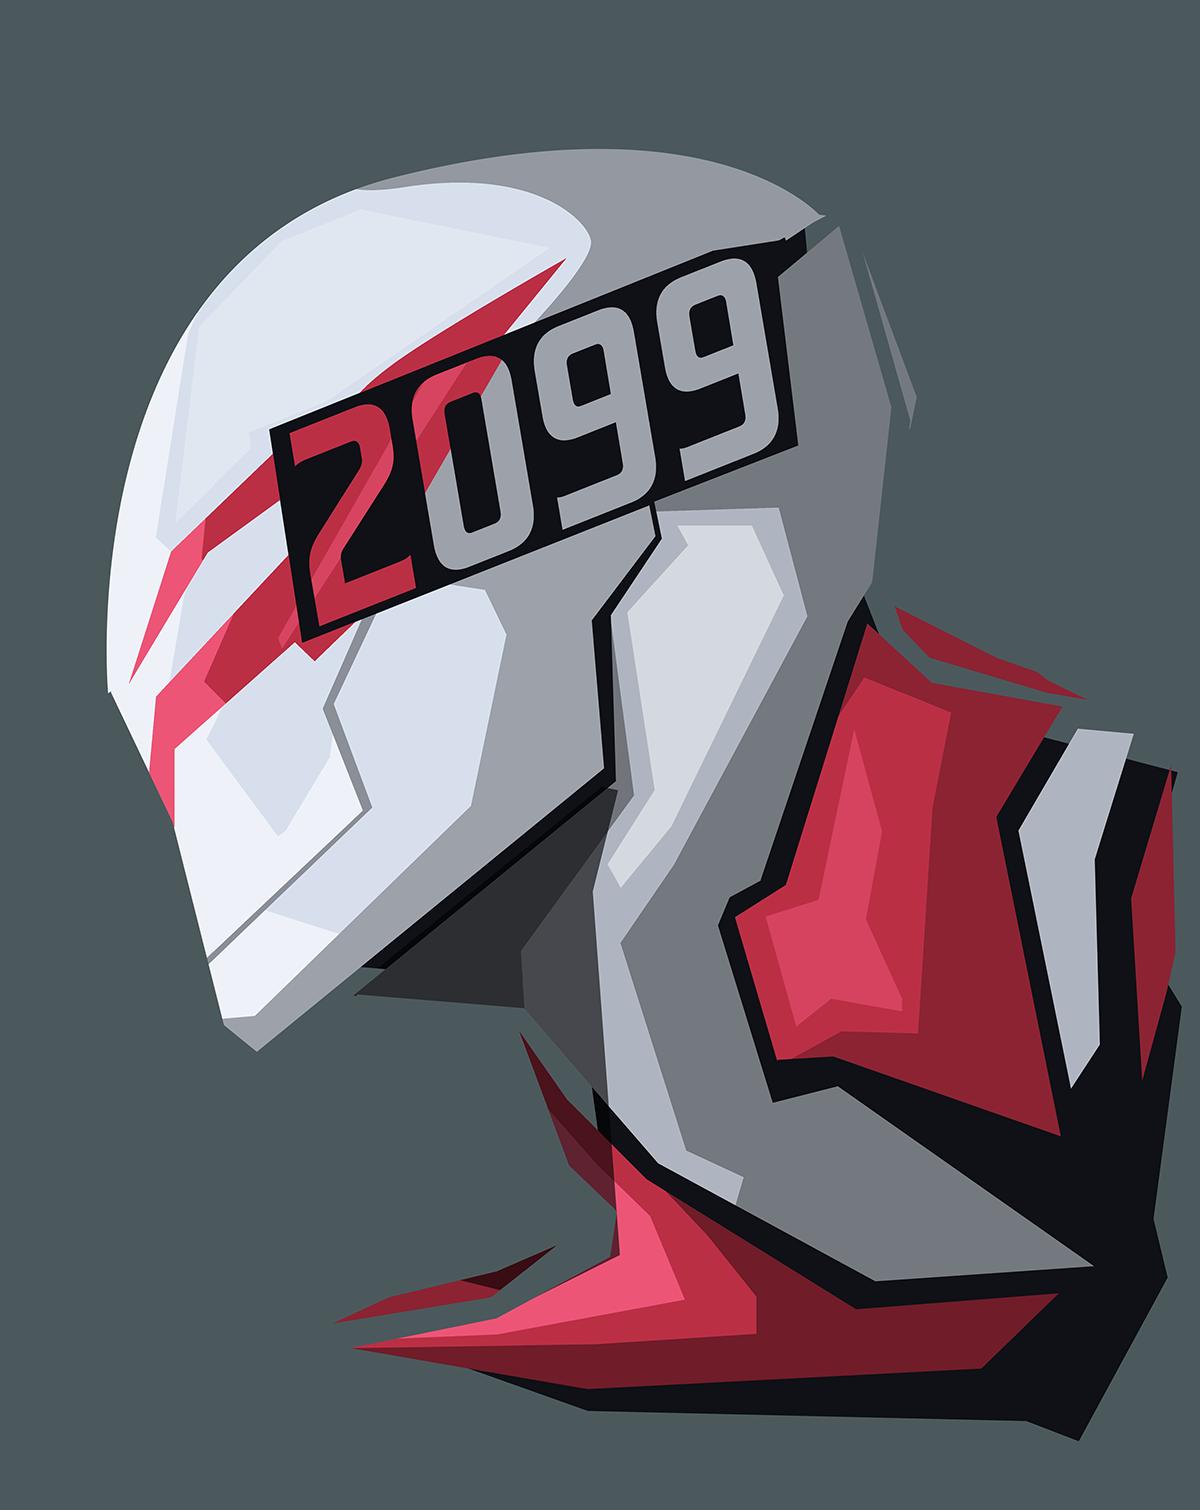 Spider Man 2099 gray background Marvel Comics wallpaper 1200x1510